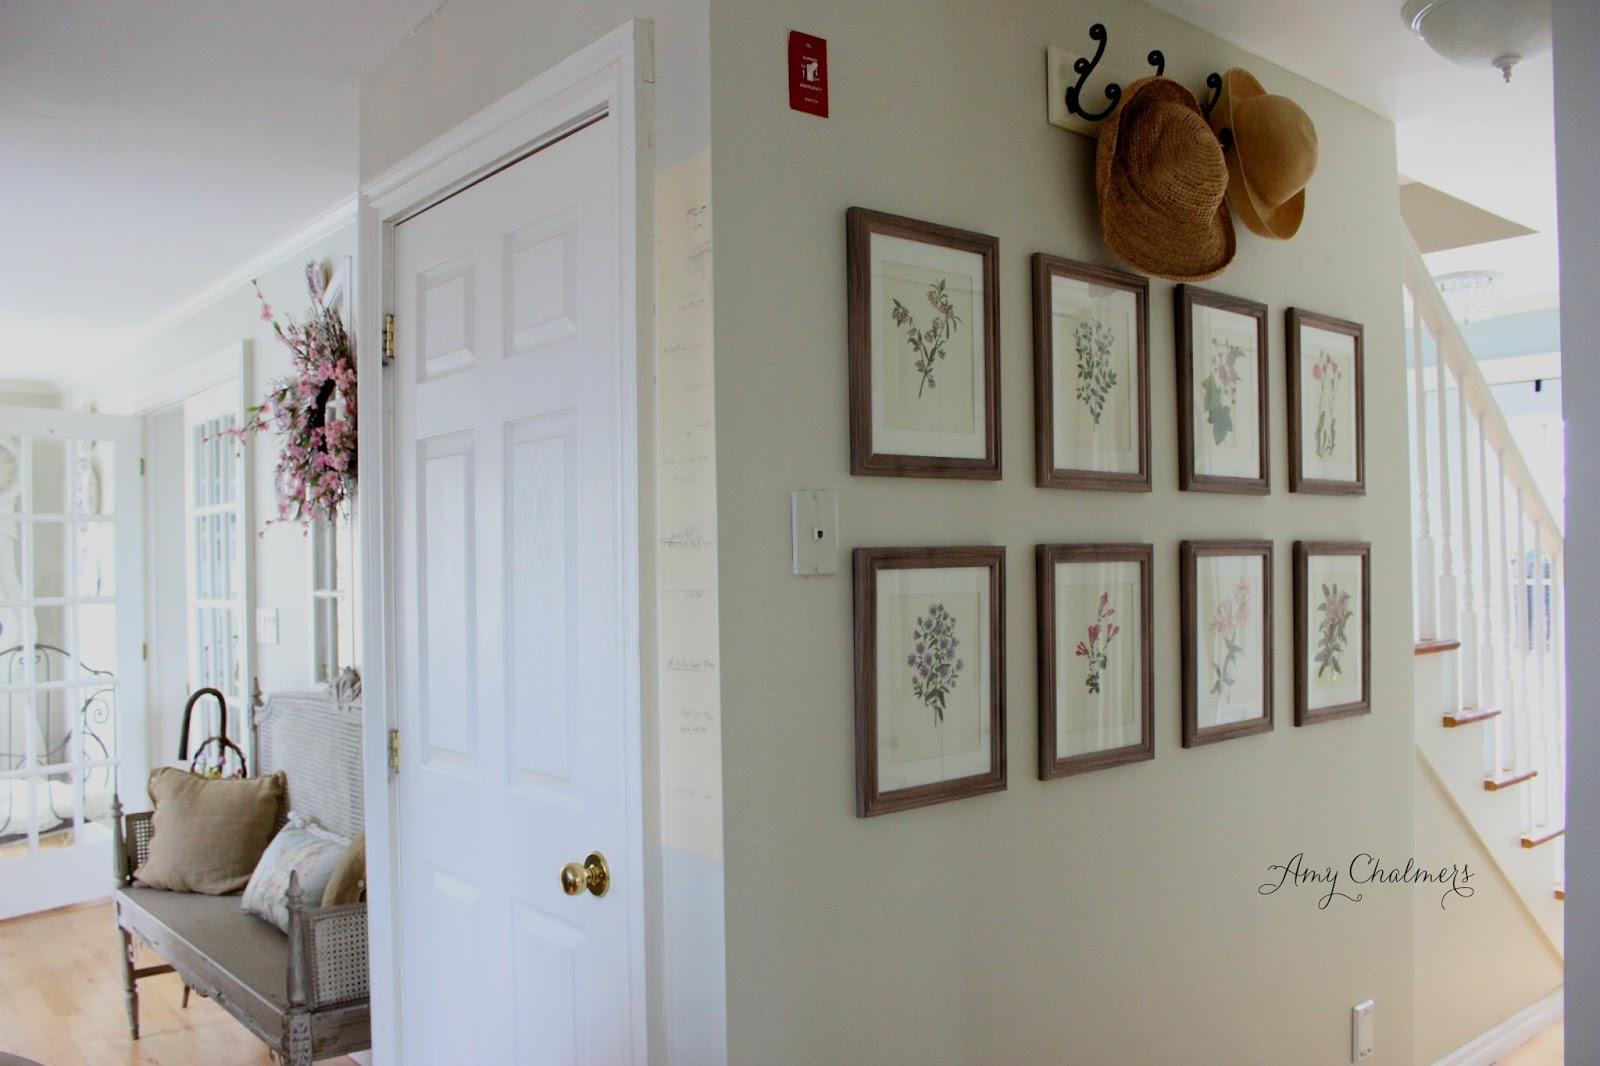 Home Decor Wall Groupings : Maison decor create a botanical wall grouping